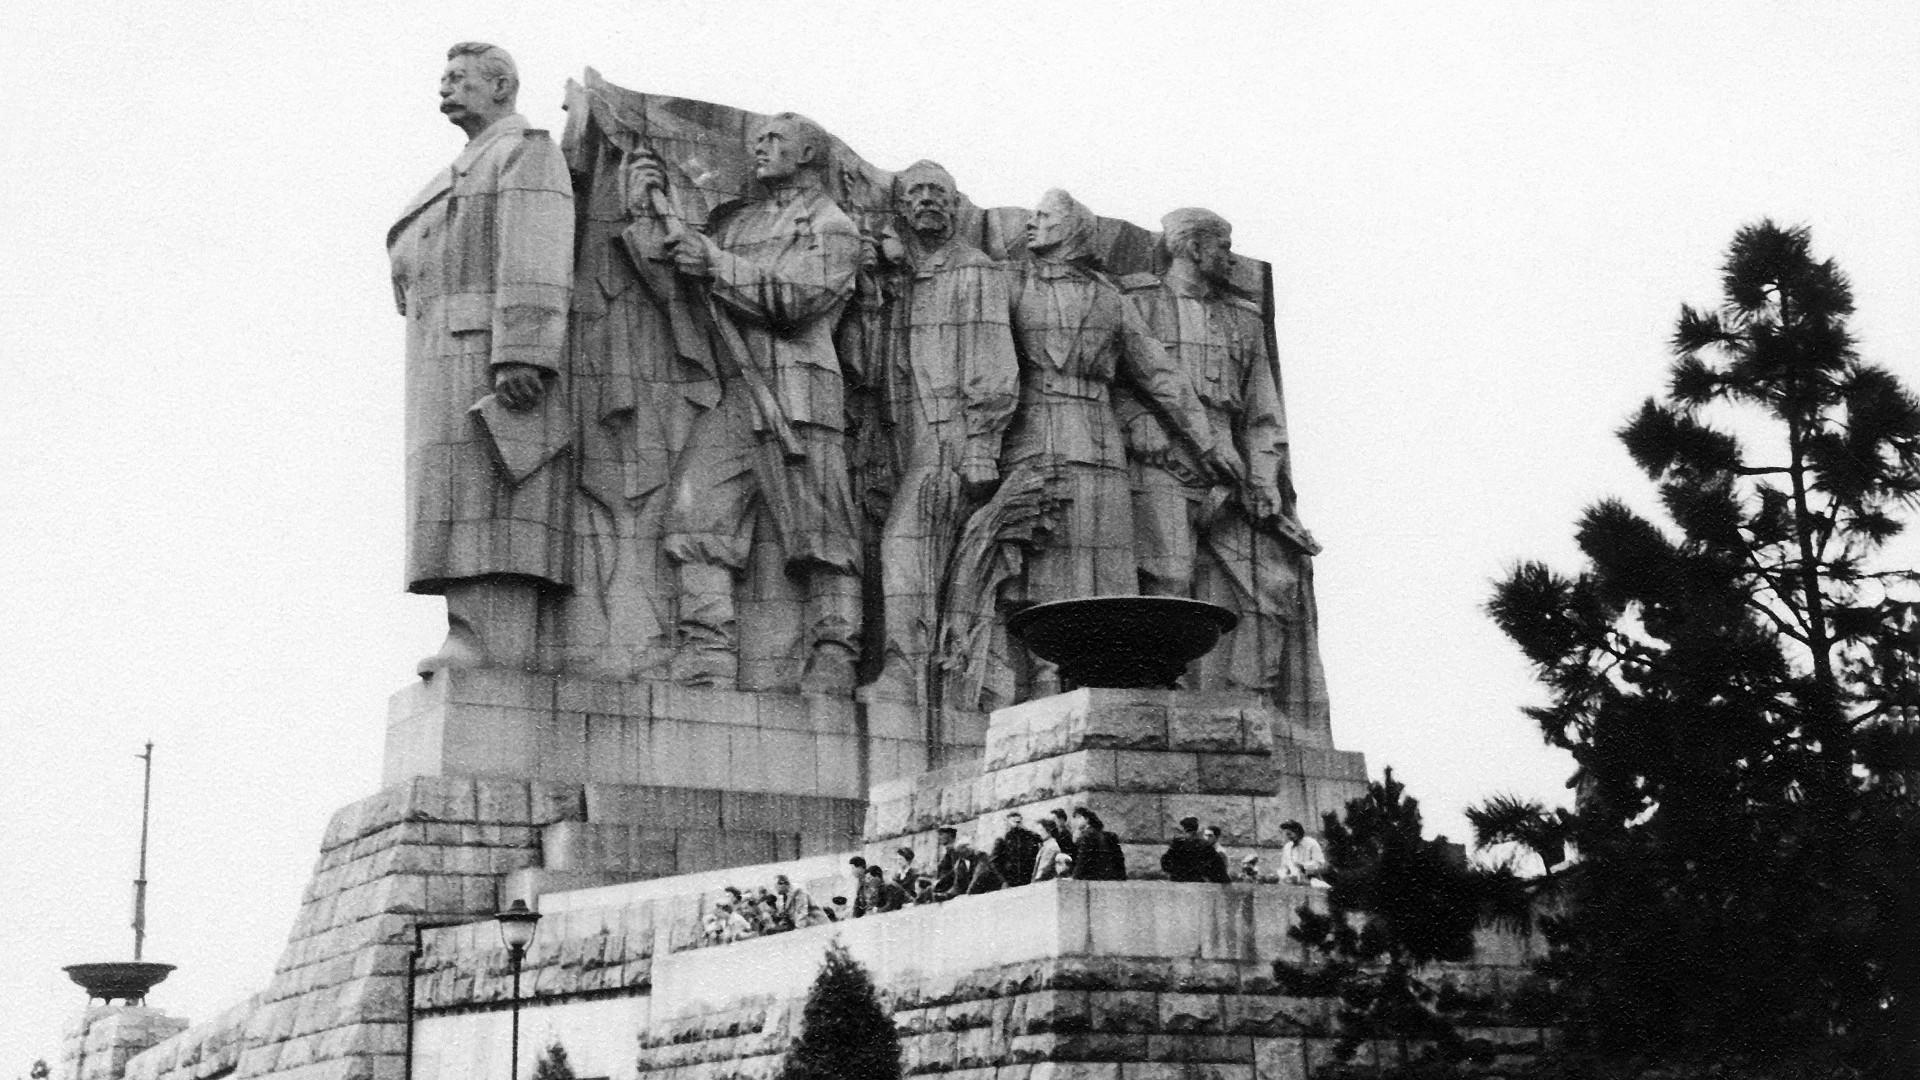 Sebuah monumen untuk Josef Stalin di Praha, Cekoslovakia, 1956.